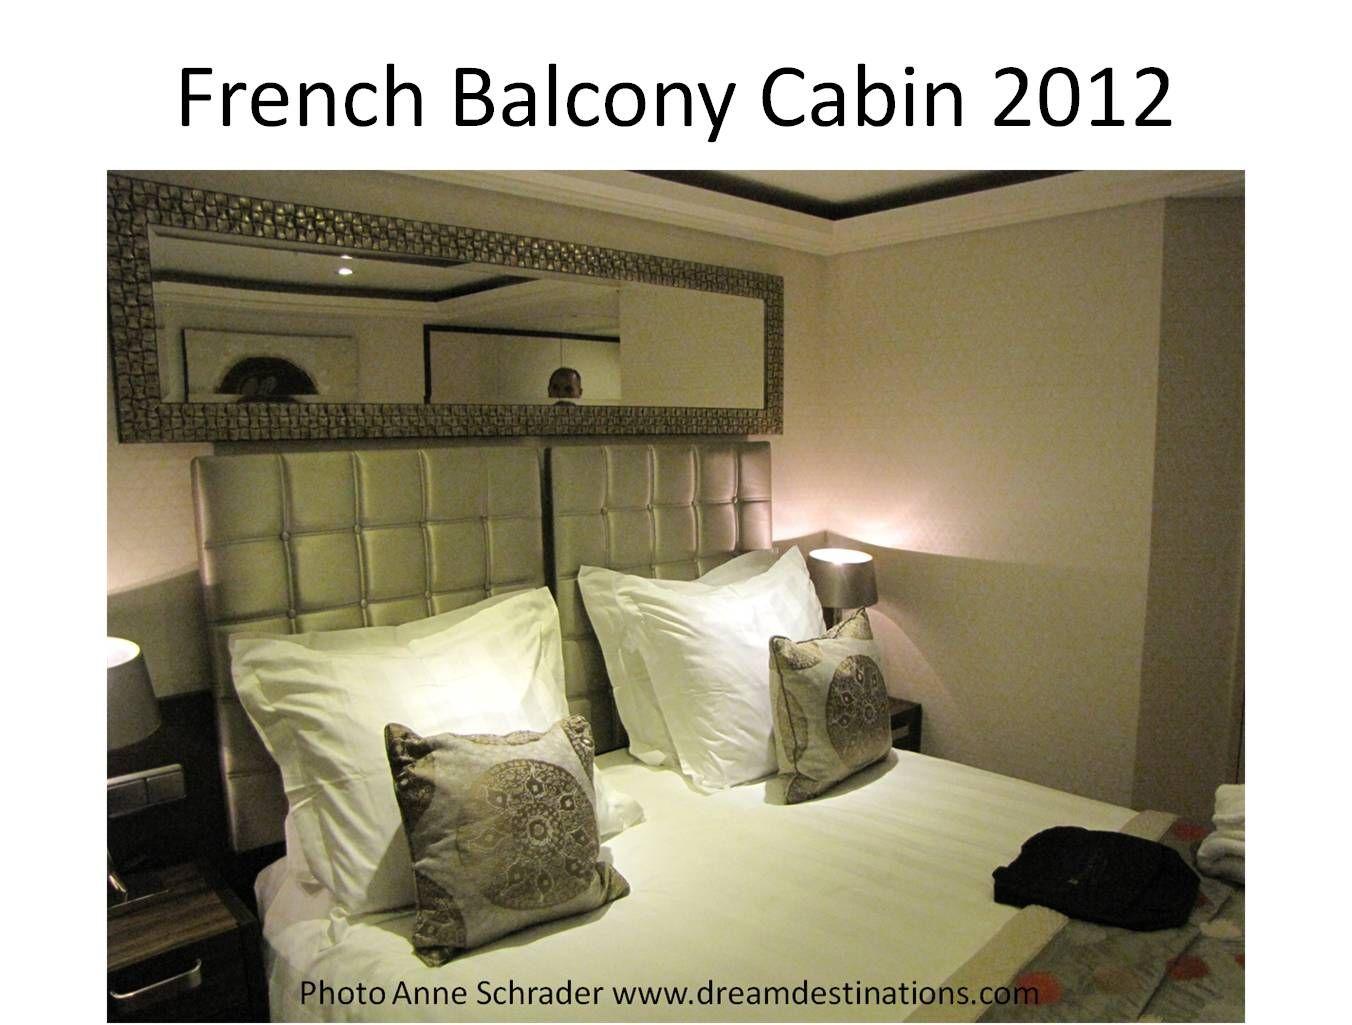 French Balcony Cabin